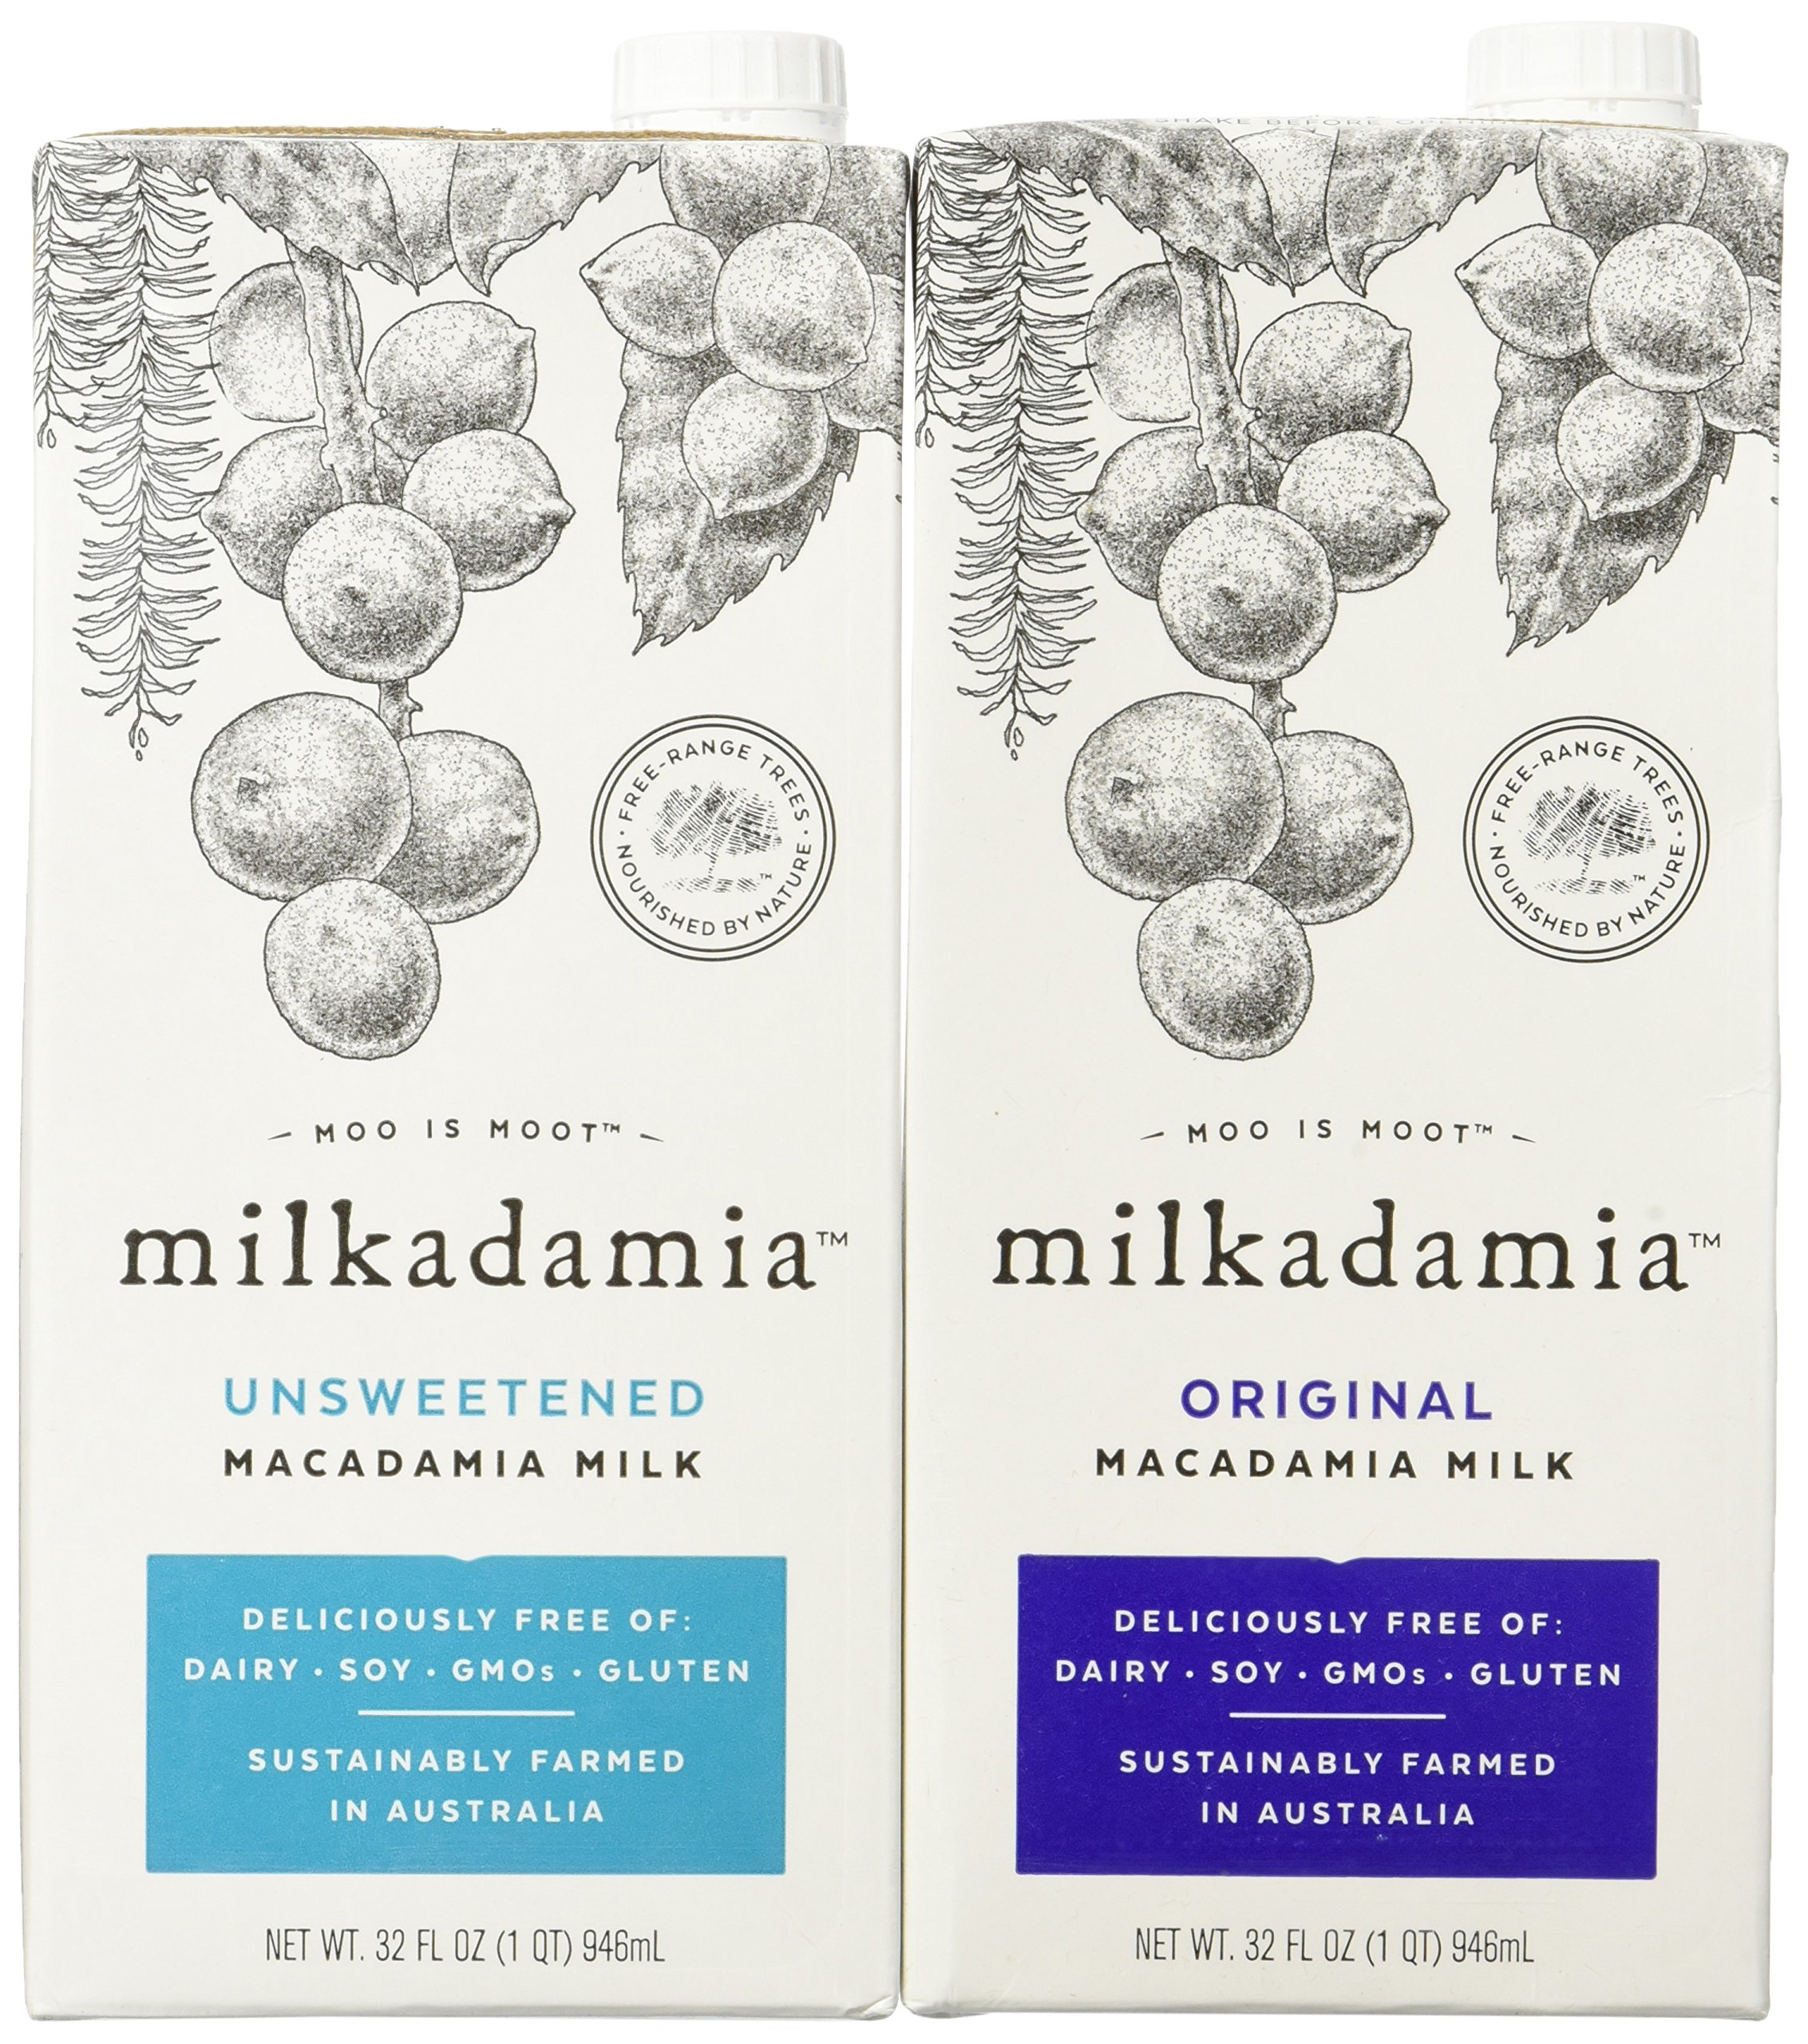 Milkadamia Variety Pack, Macadamia Milk, 32 Ounce  (Pack of 6) by Milkadamia (Image #9)